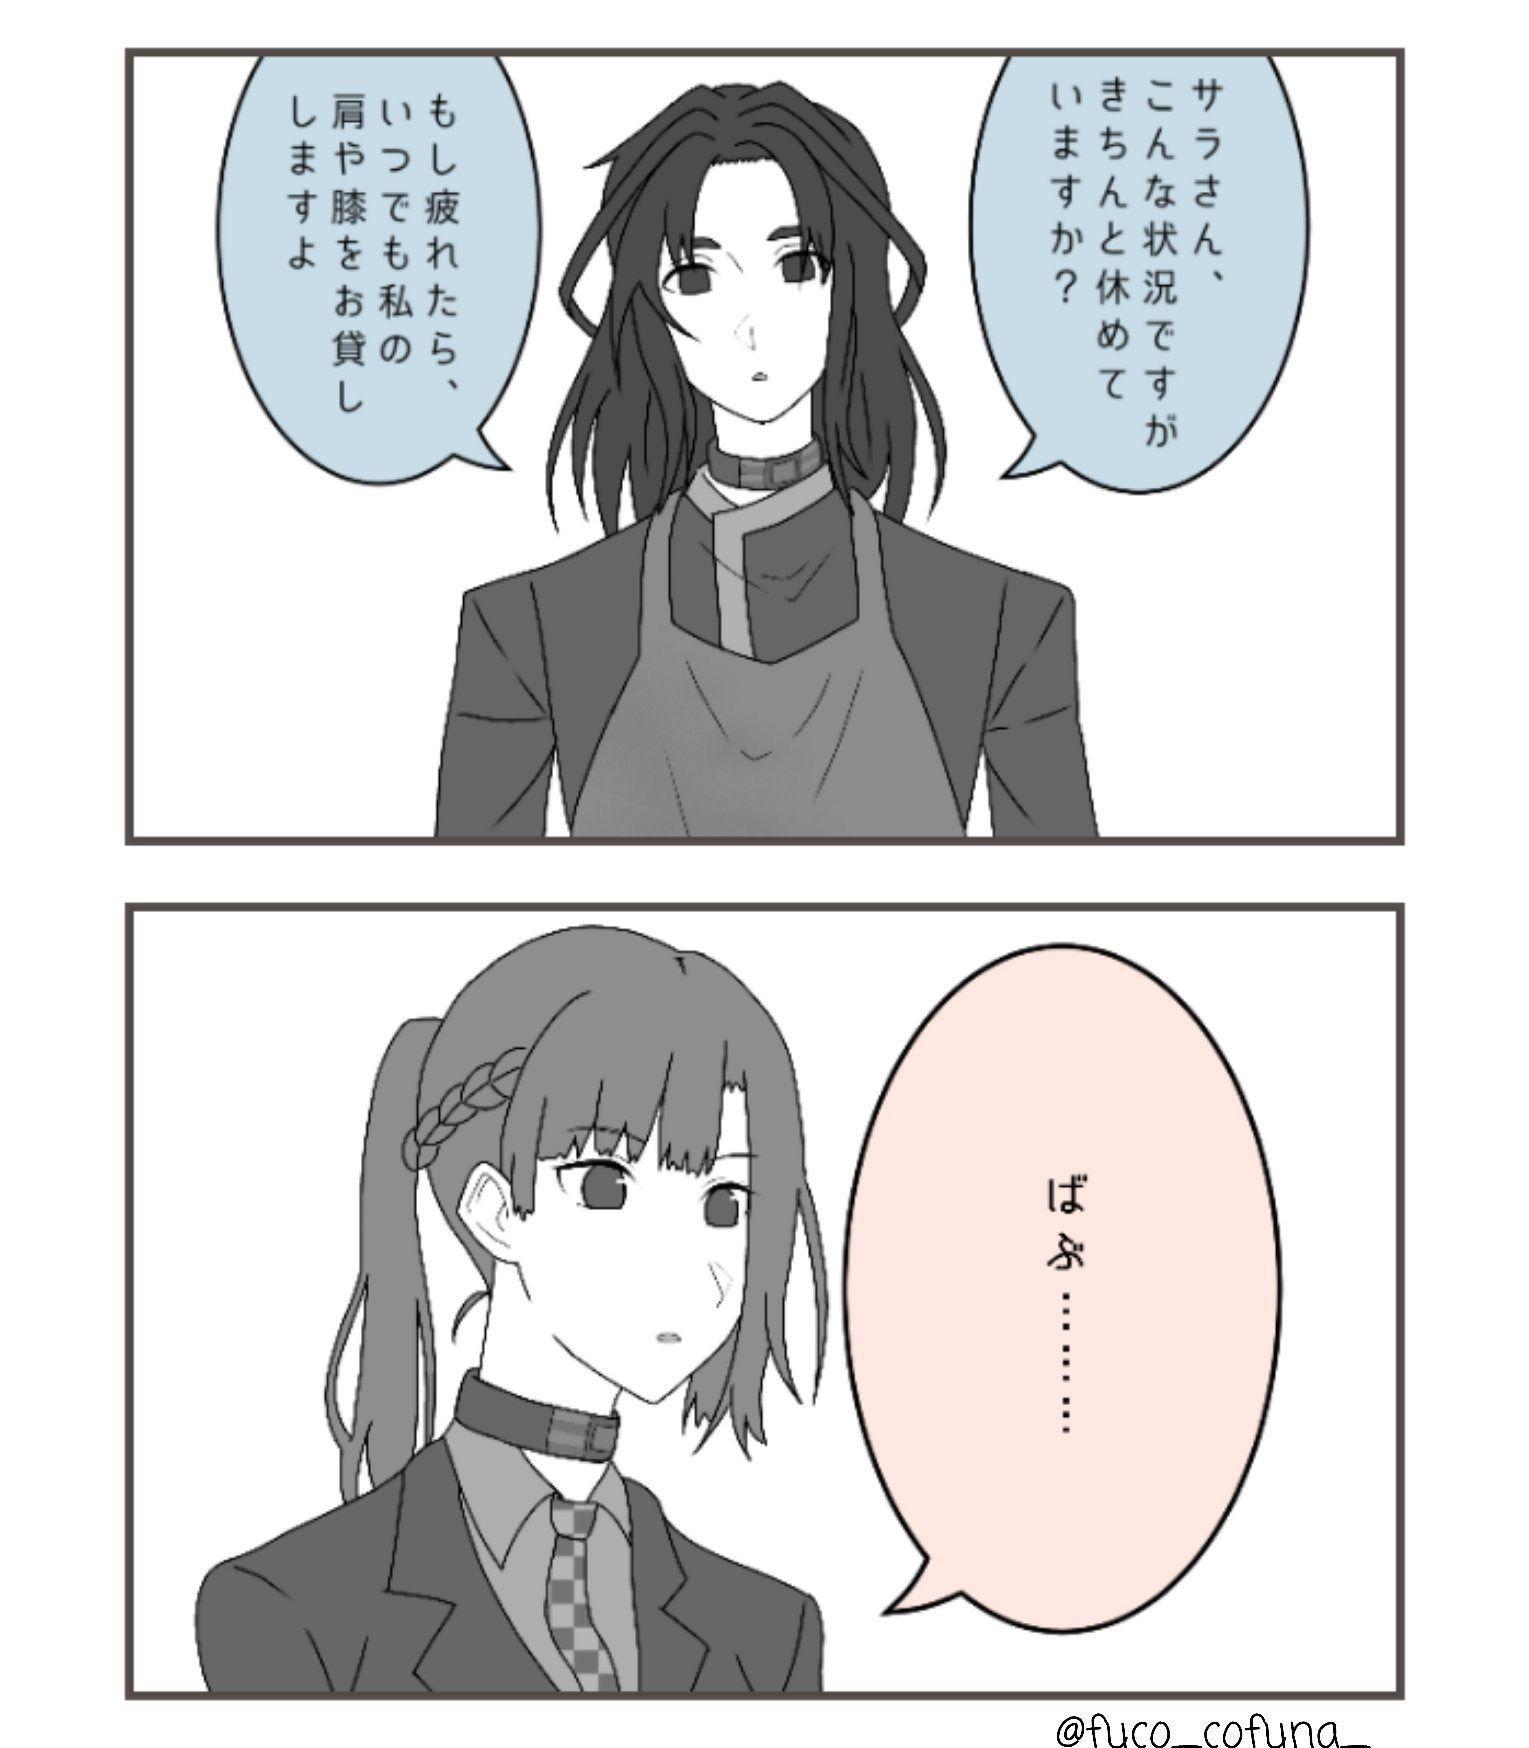 Pin by 怜 on キミガシネ、カイサラ Turn ons, Kai